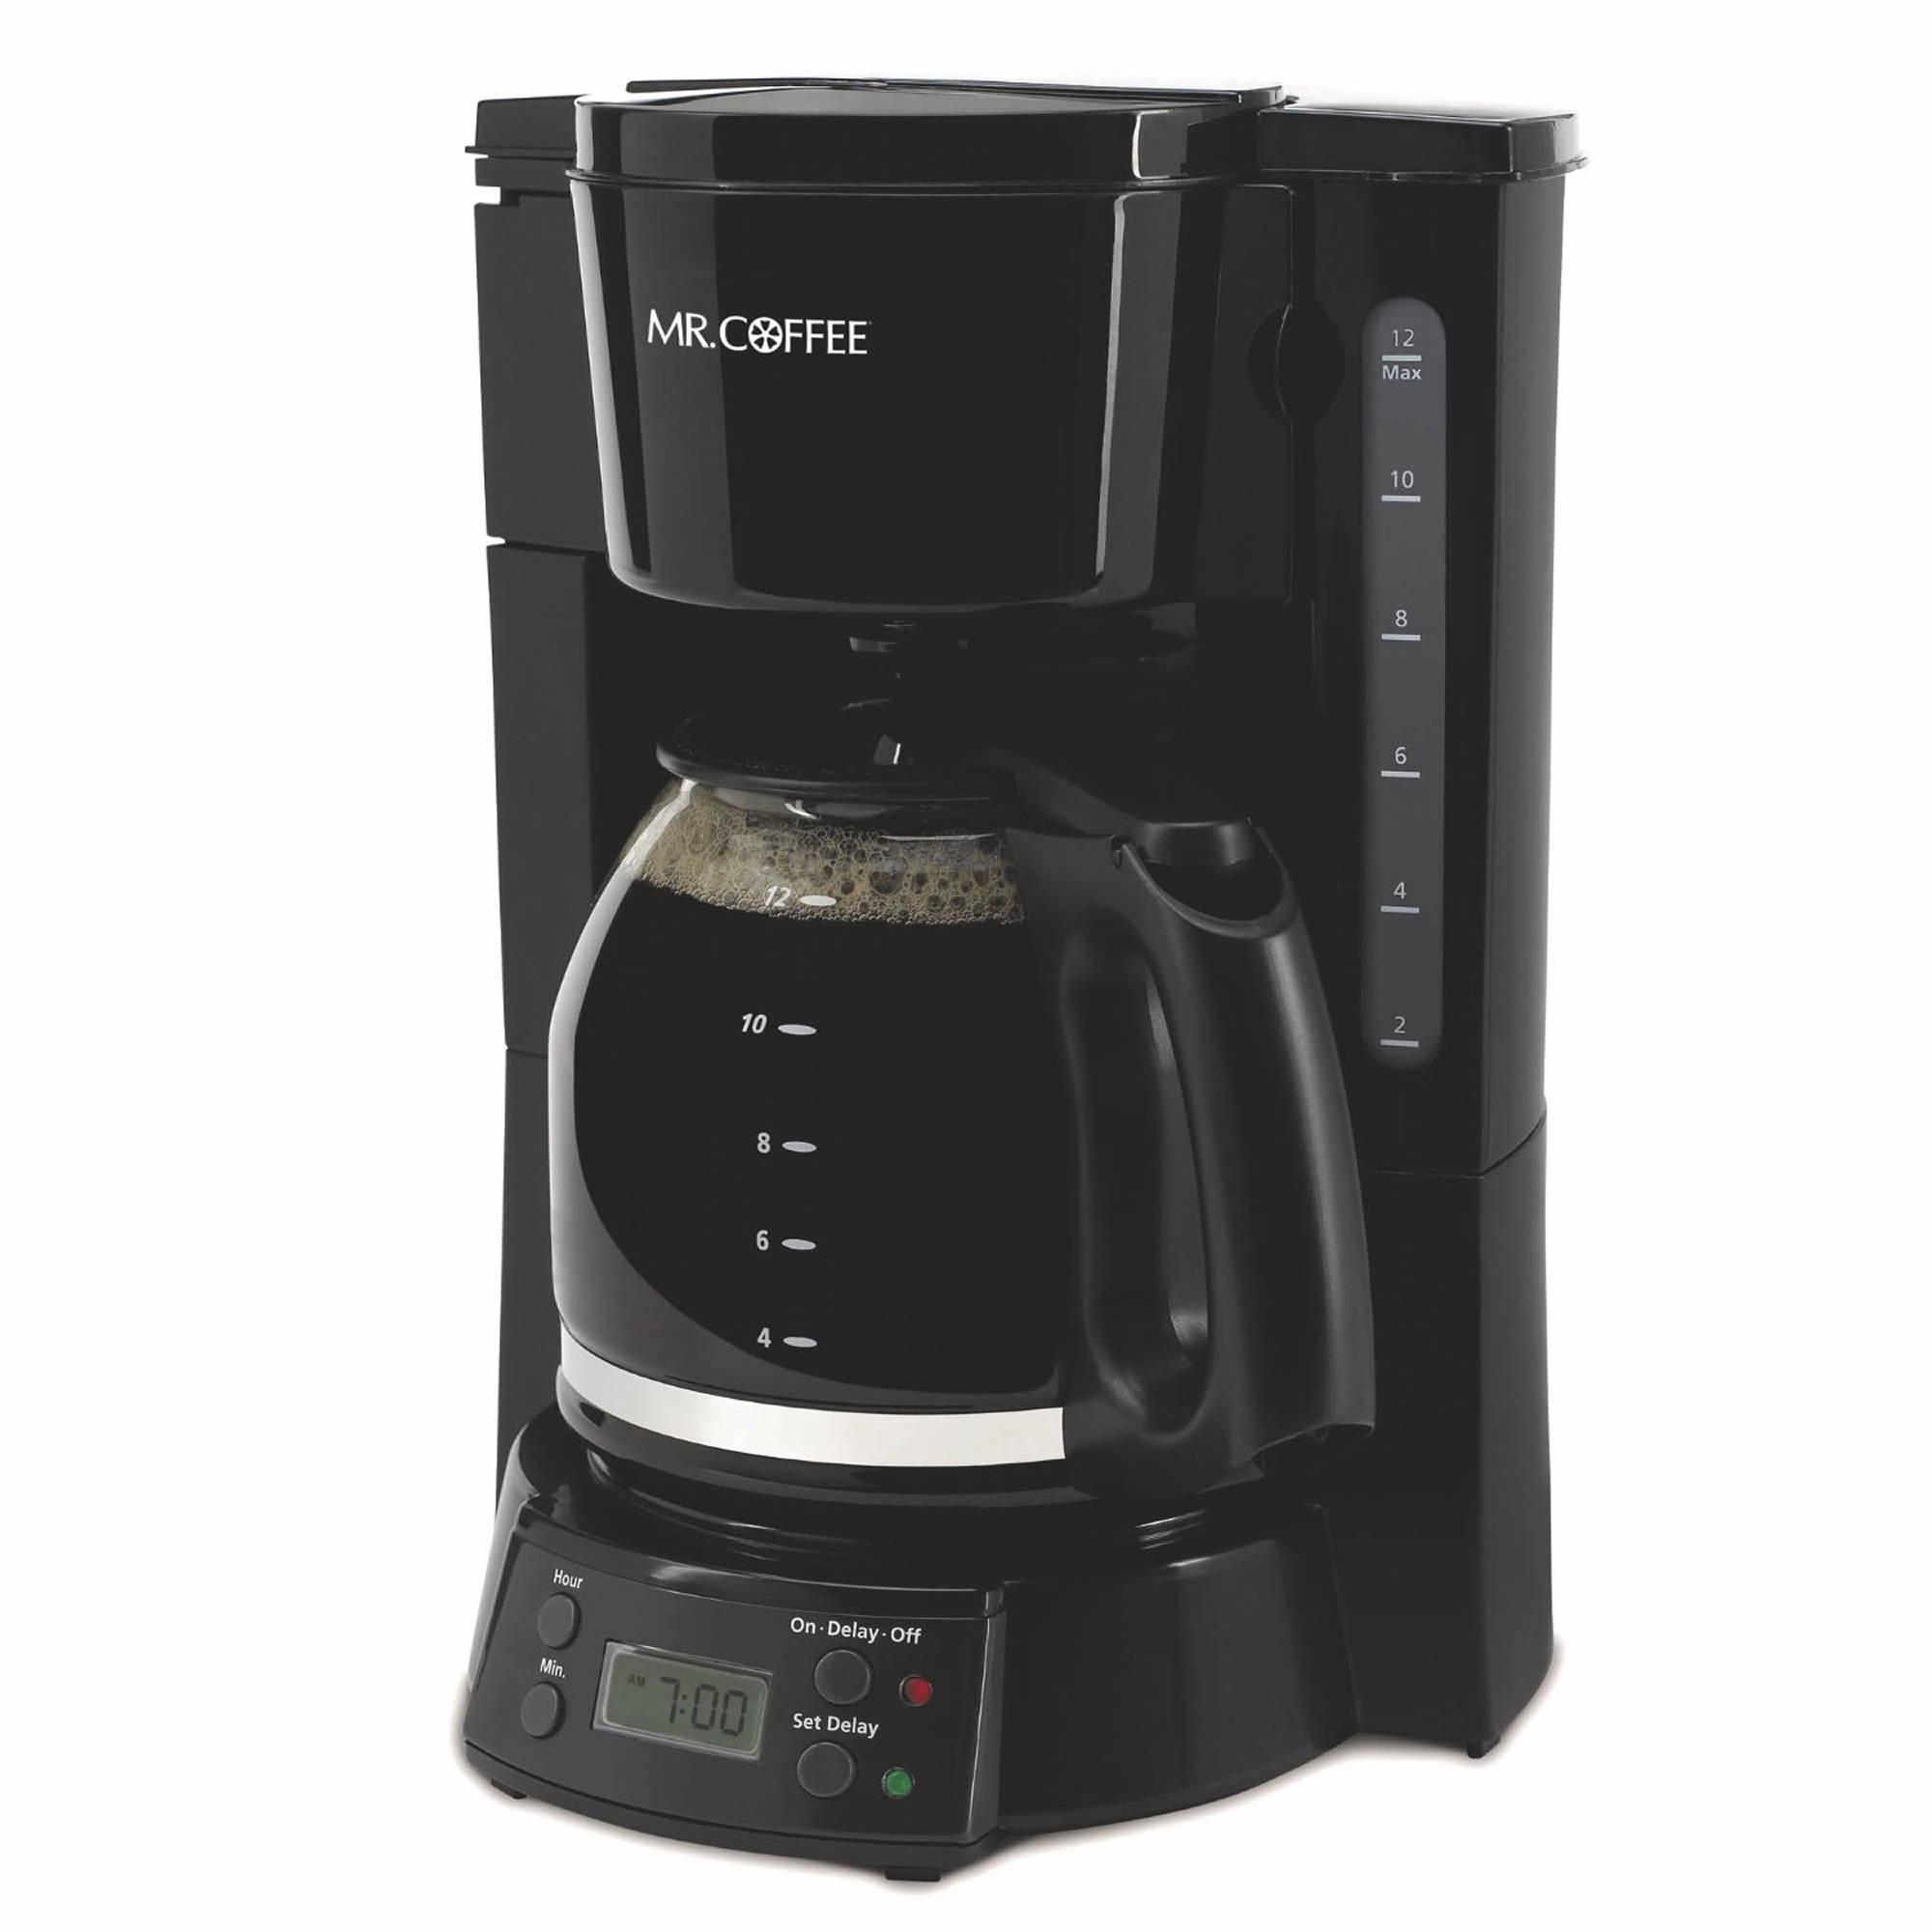 Mr Coffee 12 Cup Programmable Coffee Maker Black Bj S